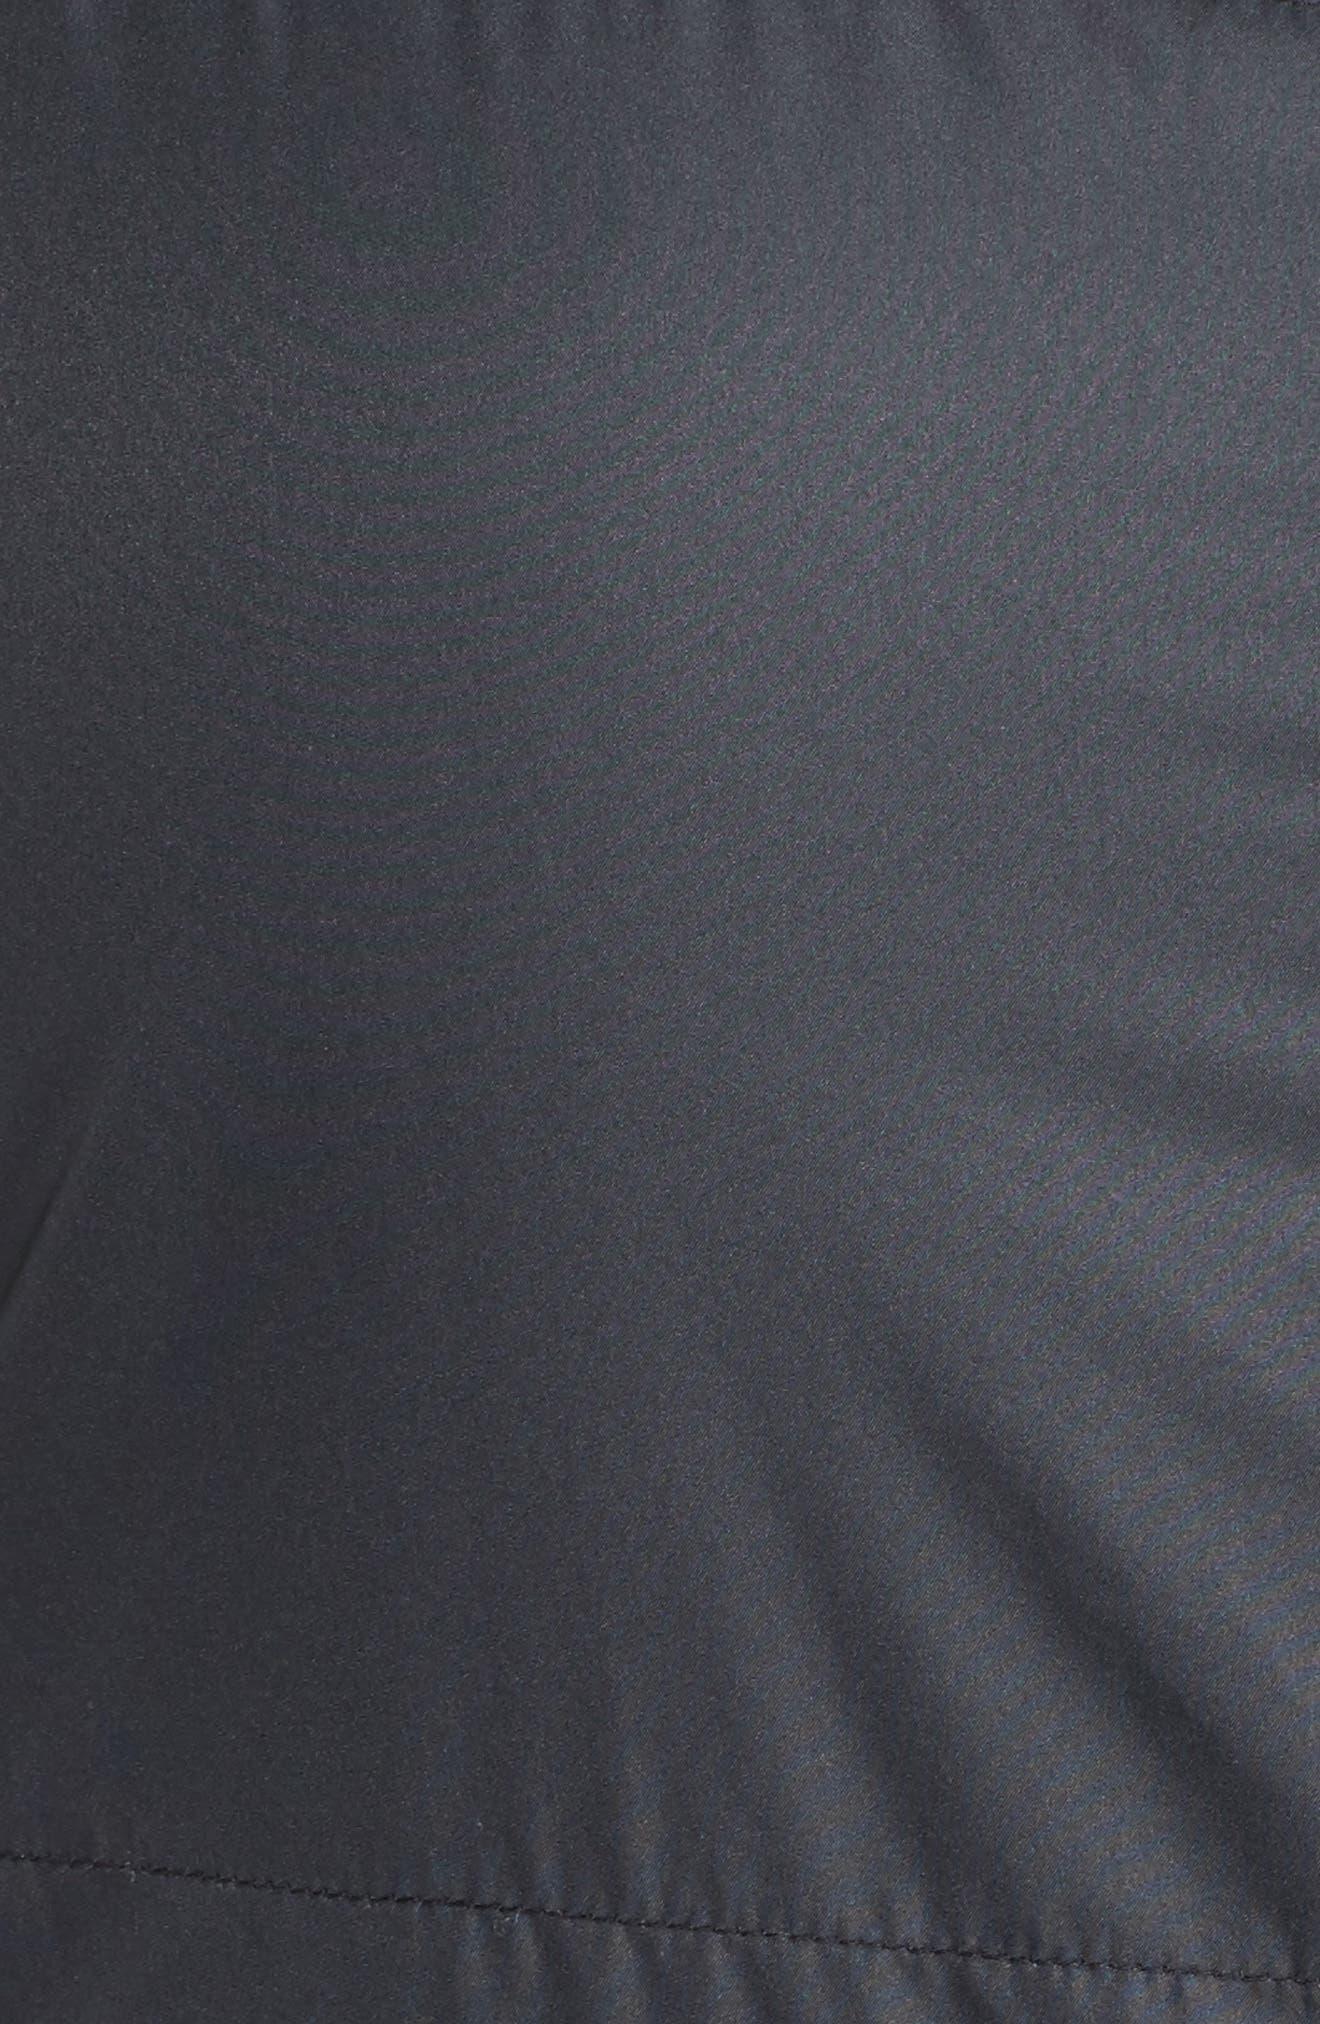 Shining Light II Quilted Vest,                             Alternate thumbnail 5, color,                             Black